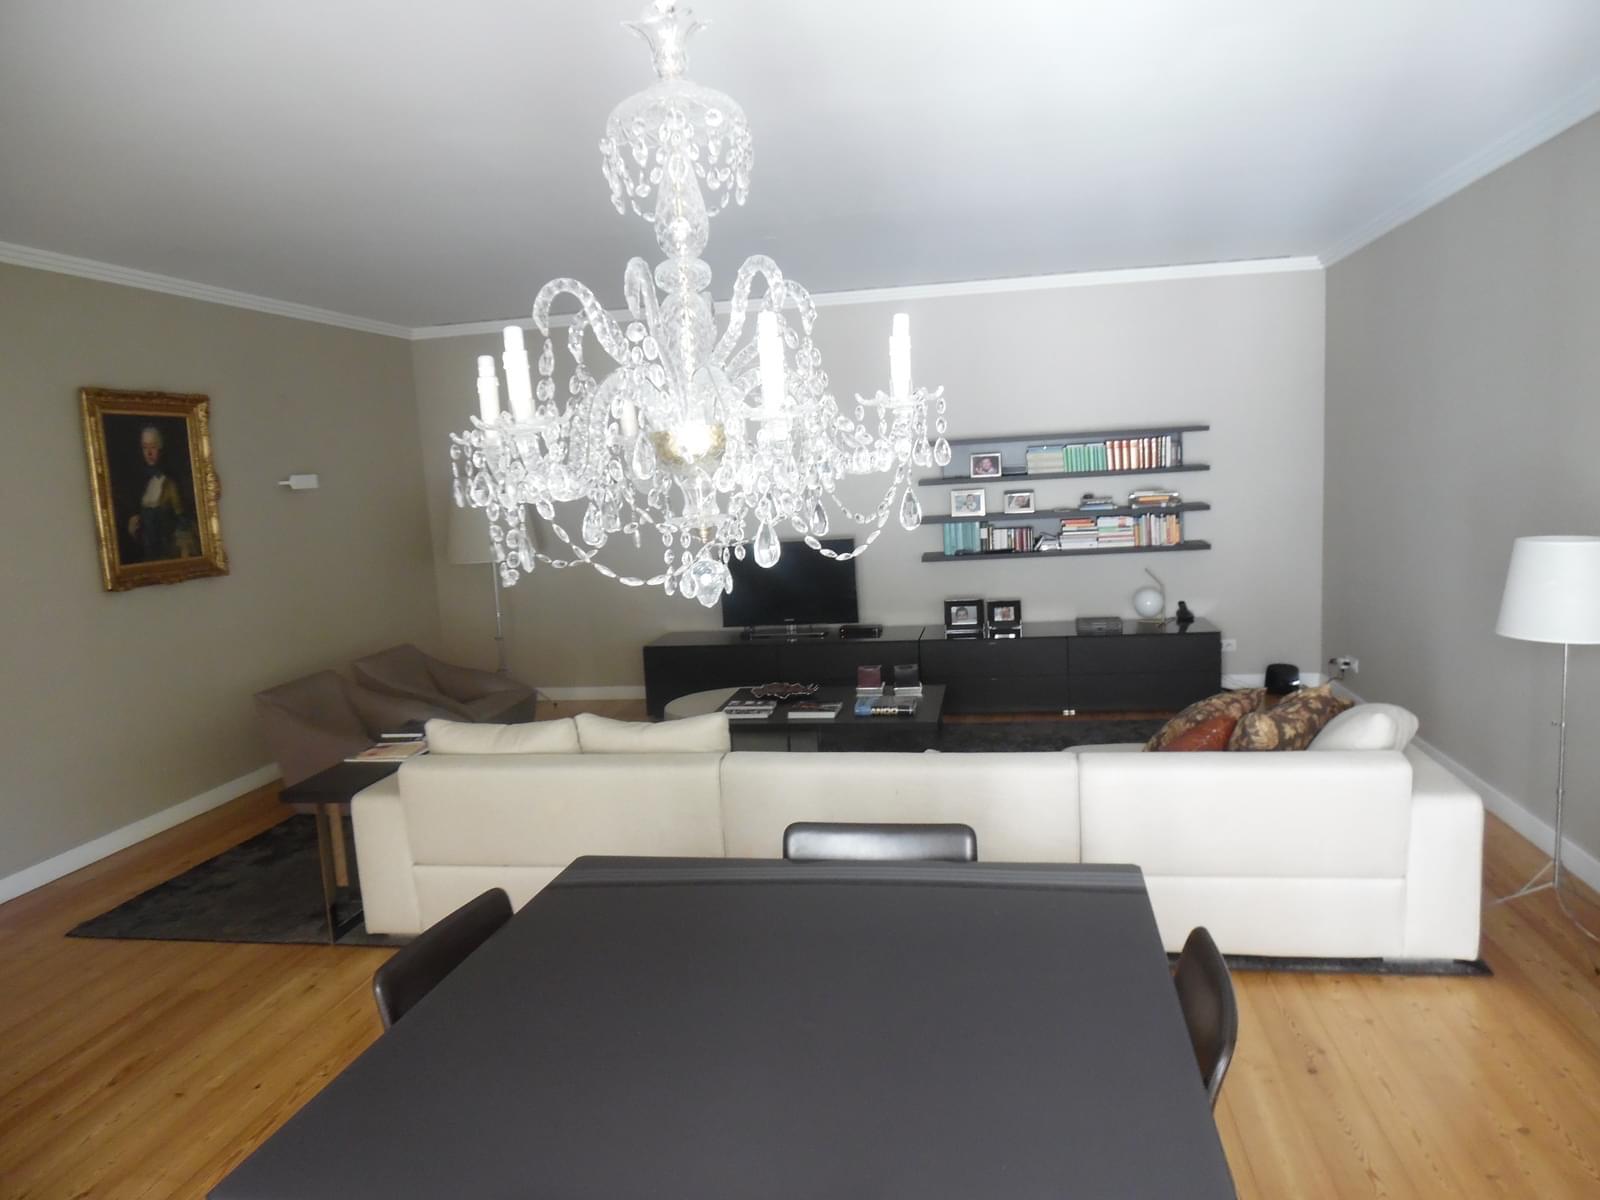 pf17454-apartamento-t4-lisboa-61e9a4b6-5187-40a3-839f-0b33a03cfe71